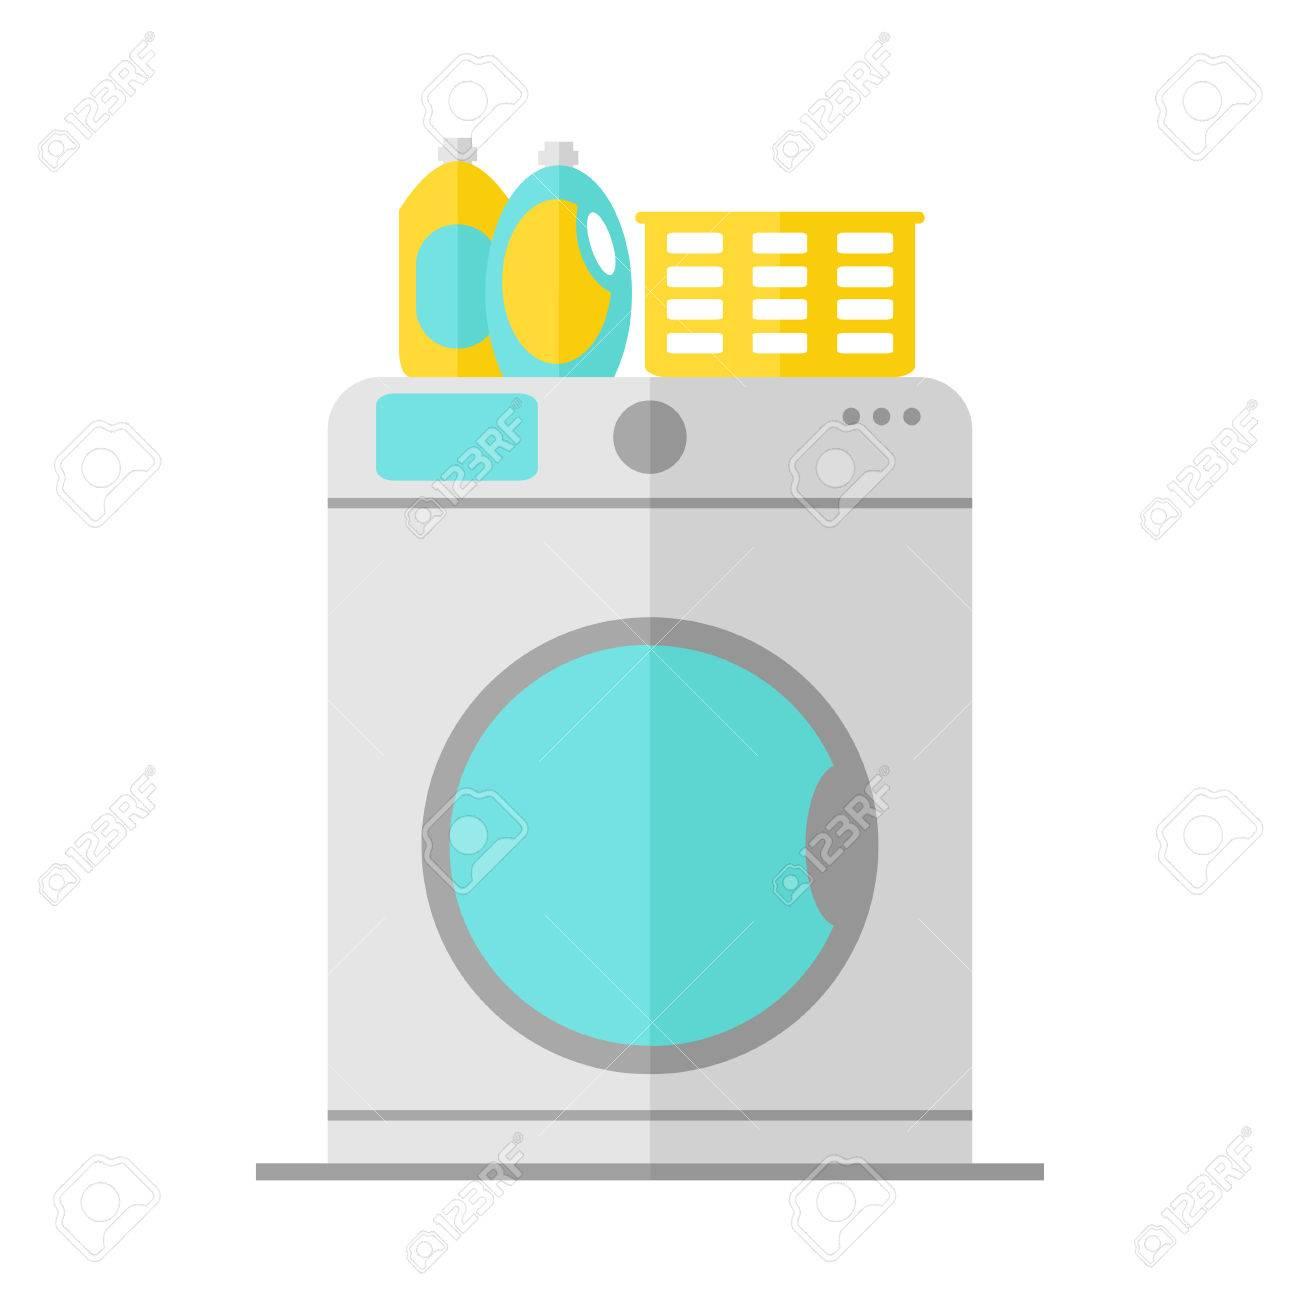 bathroom furniture clipart. washing machine isolated icon on white background. bathroom appliance icon. furniture. liquid furniture clipart